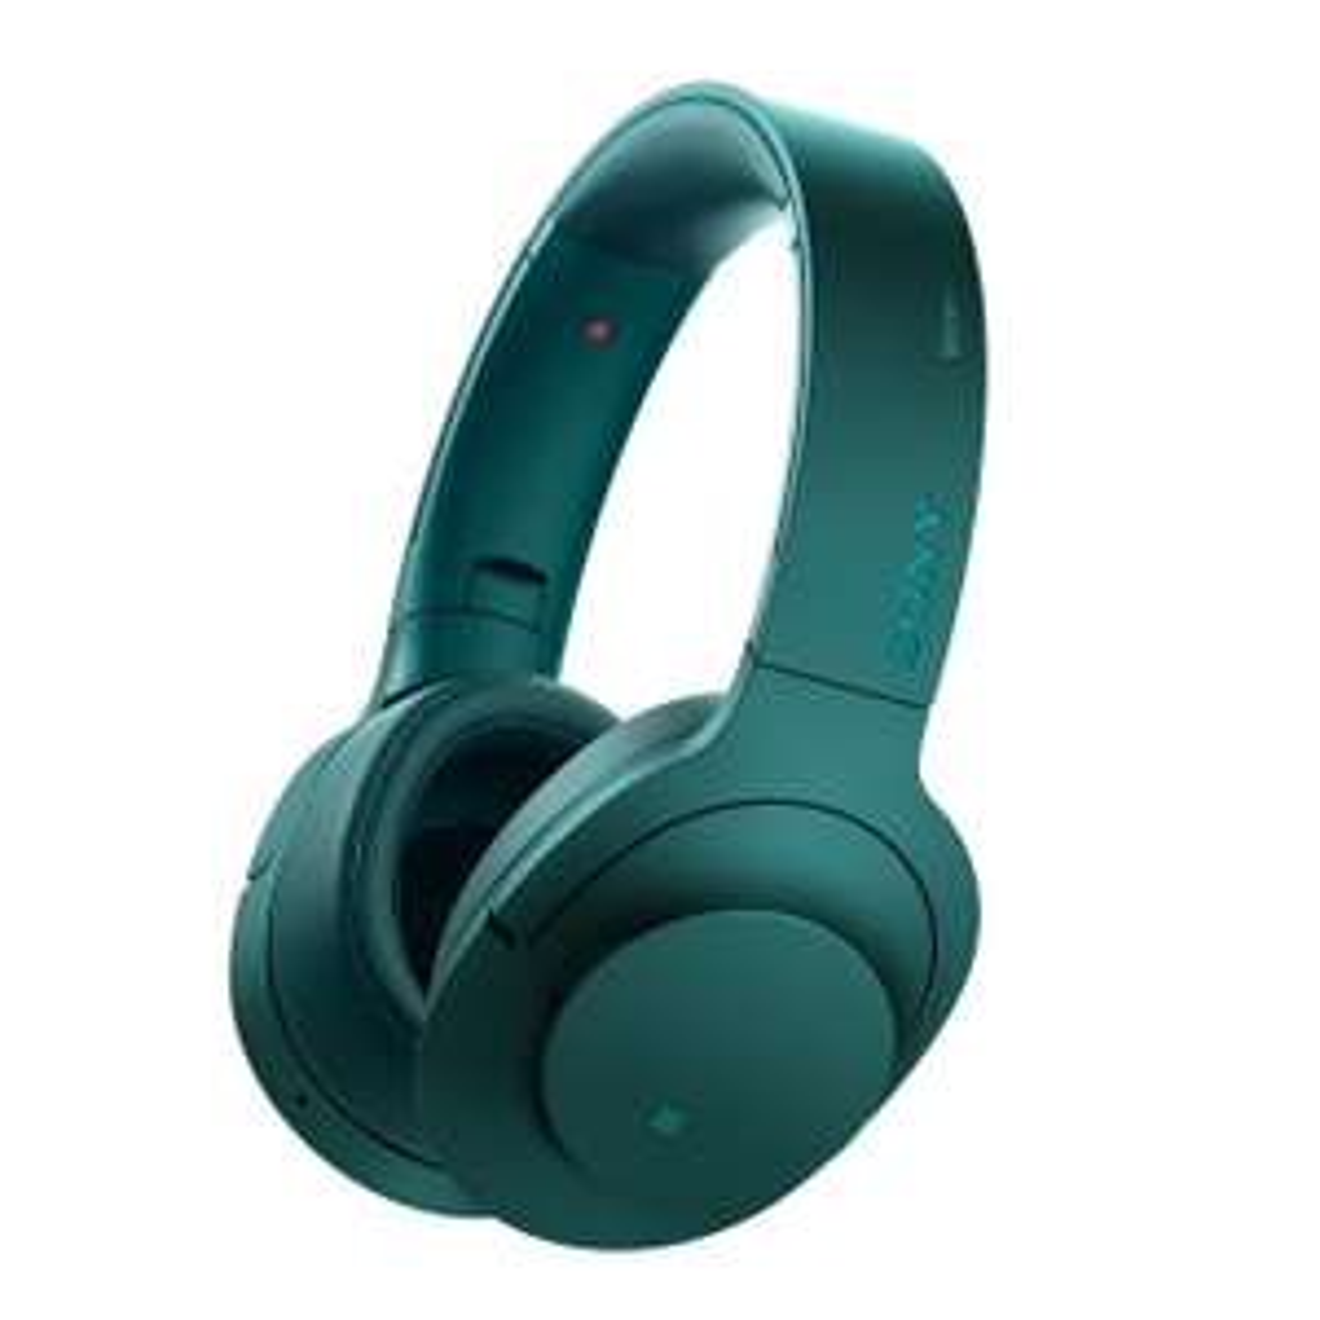 Sony MDR-100ABN High-Resolution Kopfhörer (Headset-Funktion, Noise Cancelling, kabellos, NFC, Bluetooth, 20 Stunden Akkulaufzeit, LDAC) viridianblau für 174,73€ [Amazon.it]